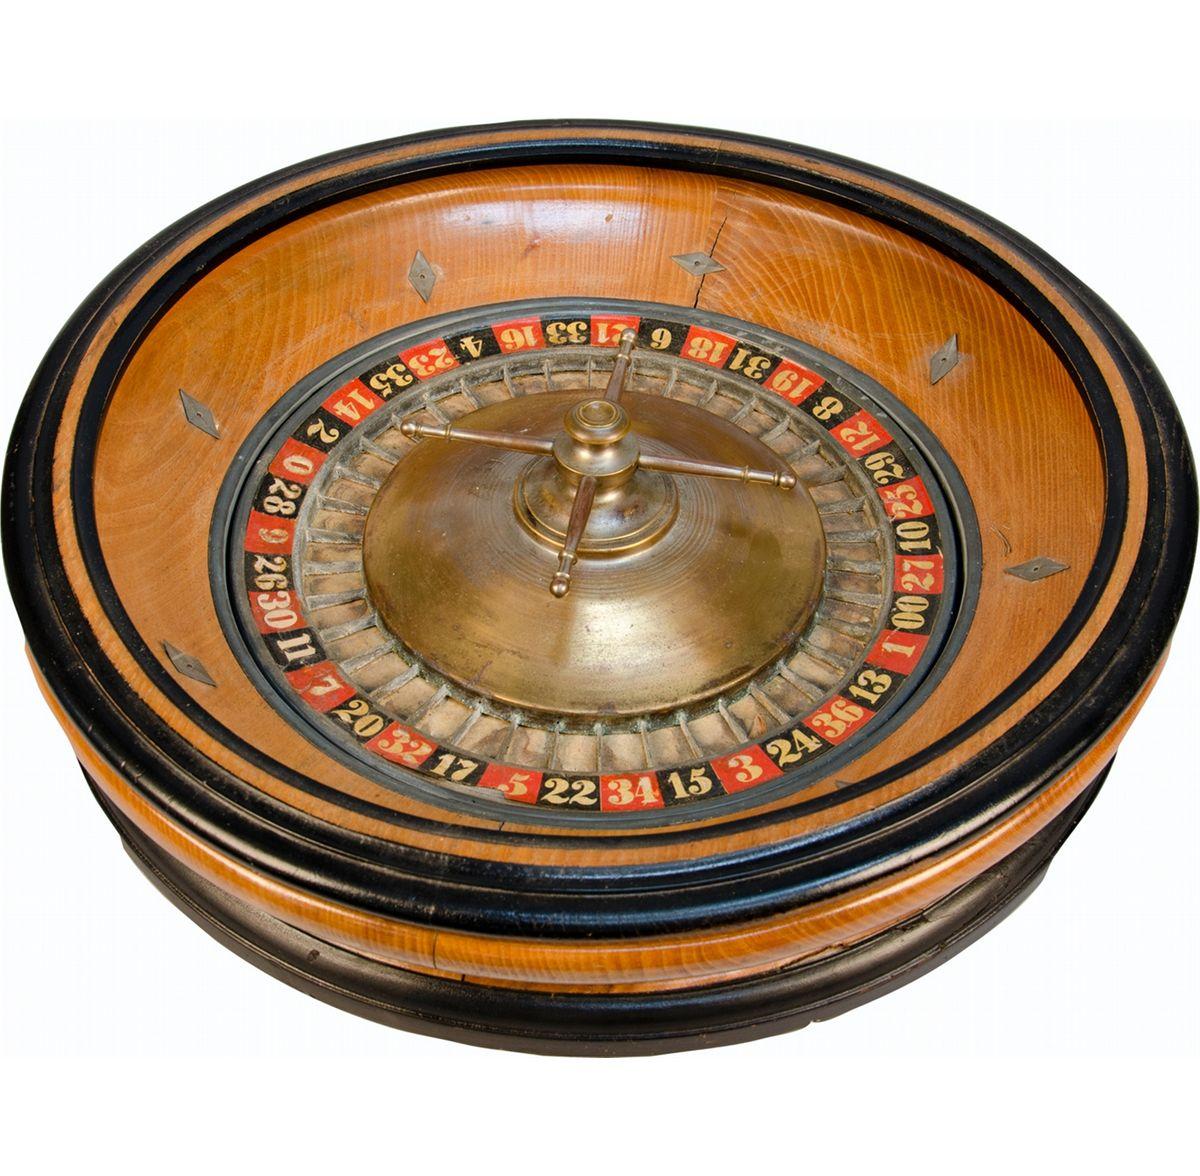 Charles Wells' Roulette Wheel